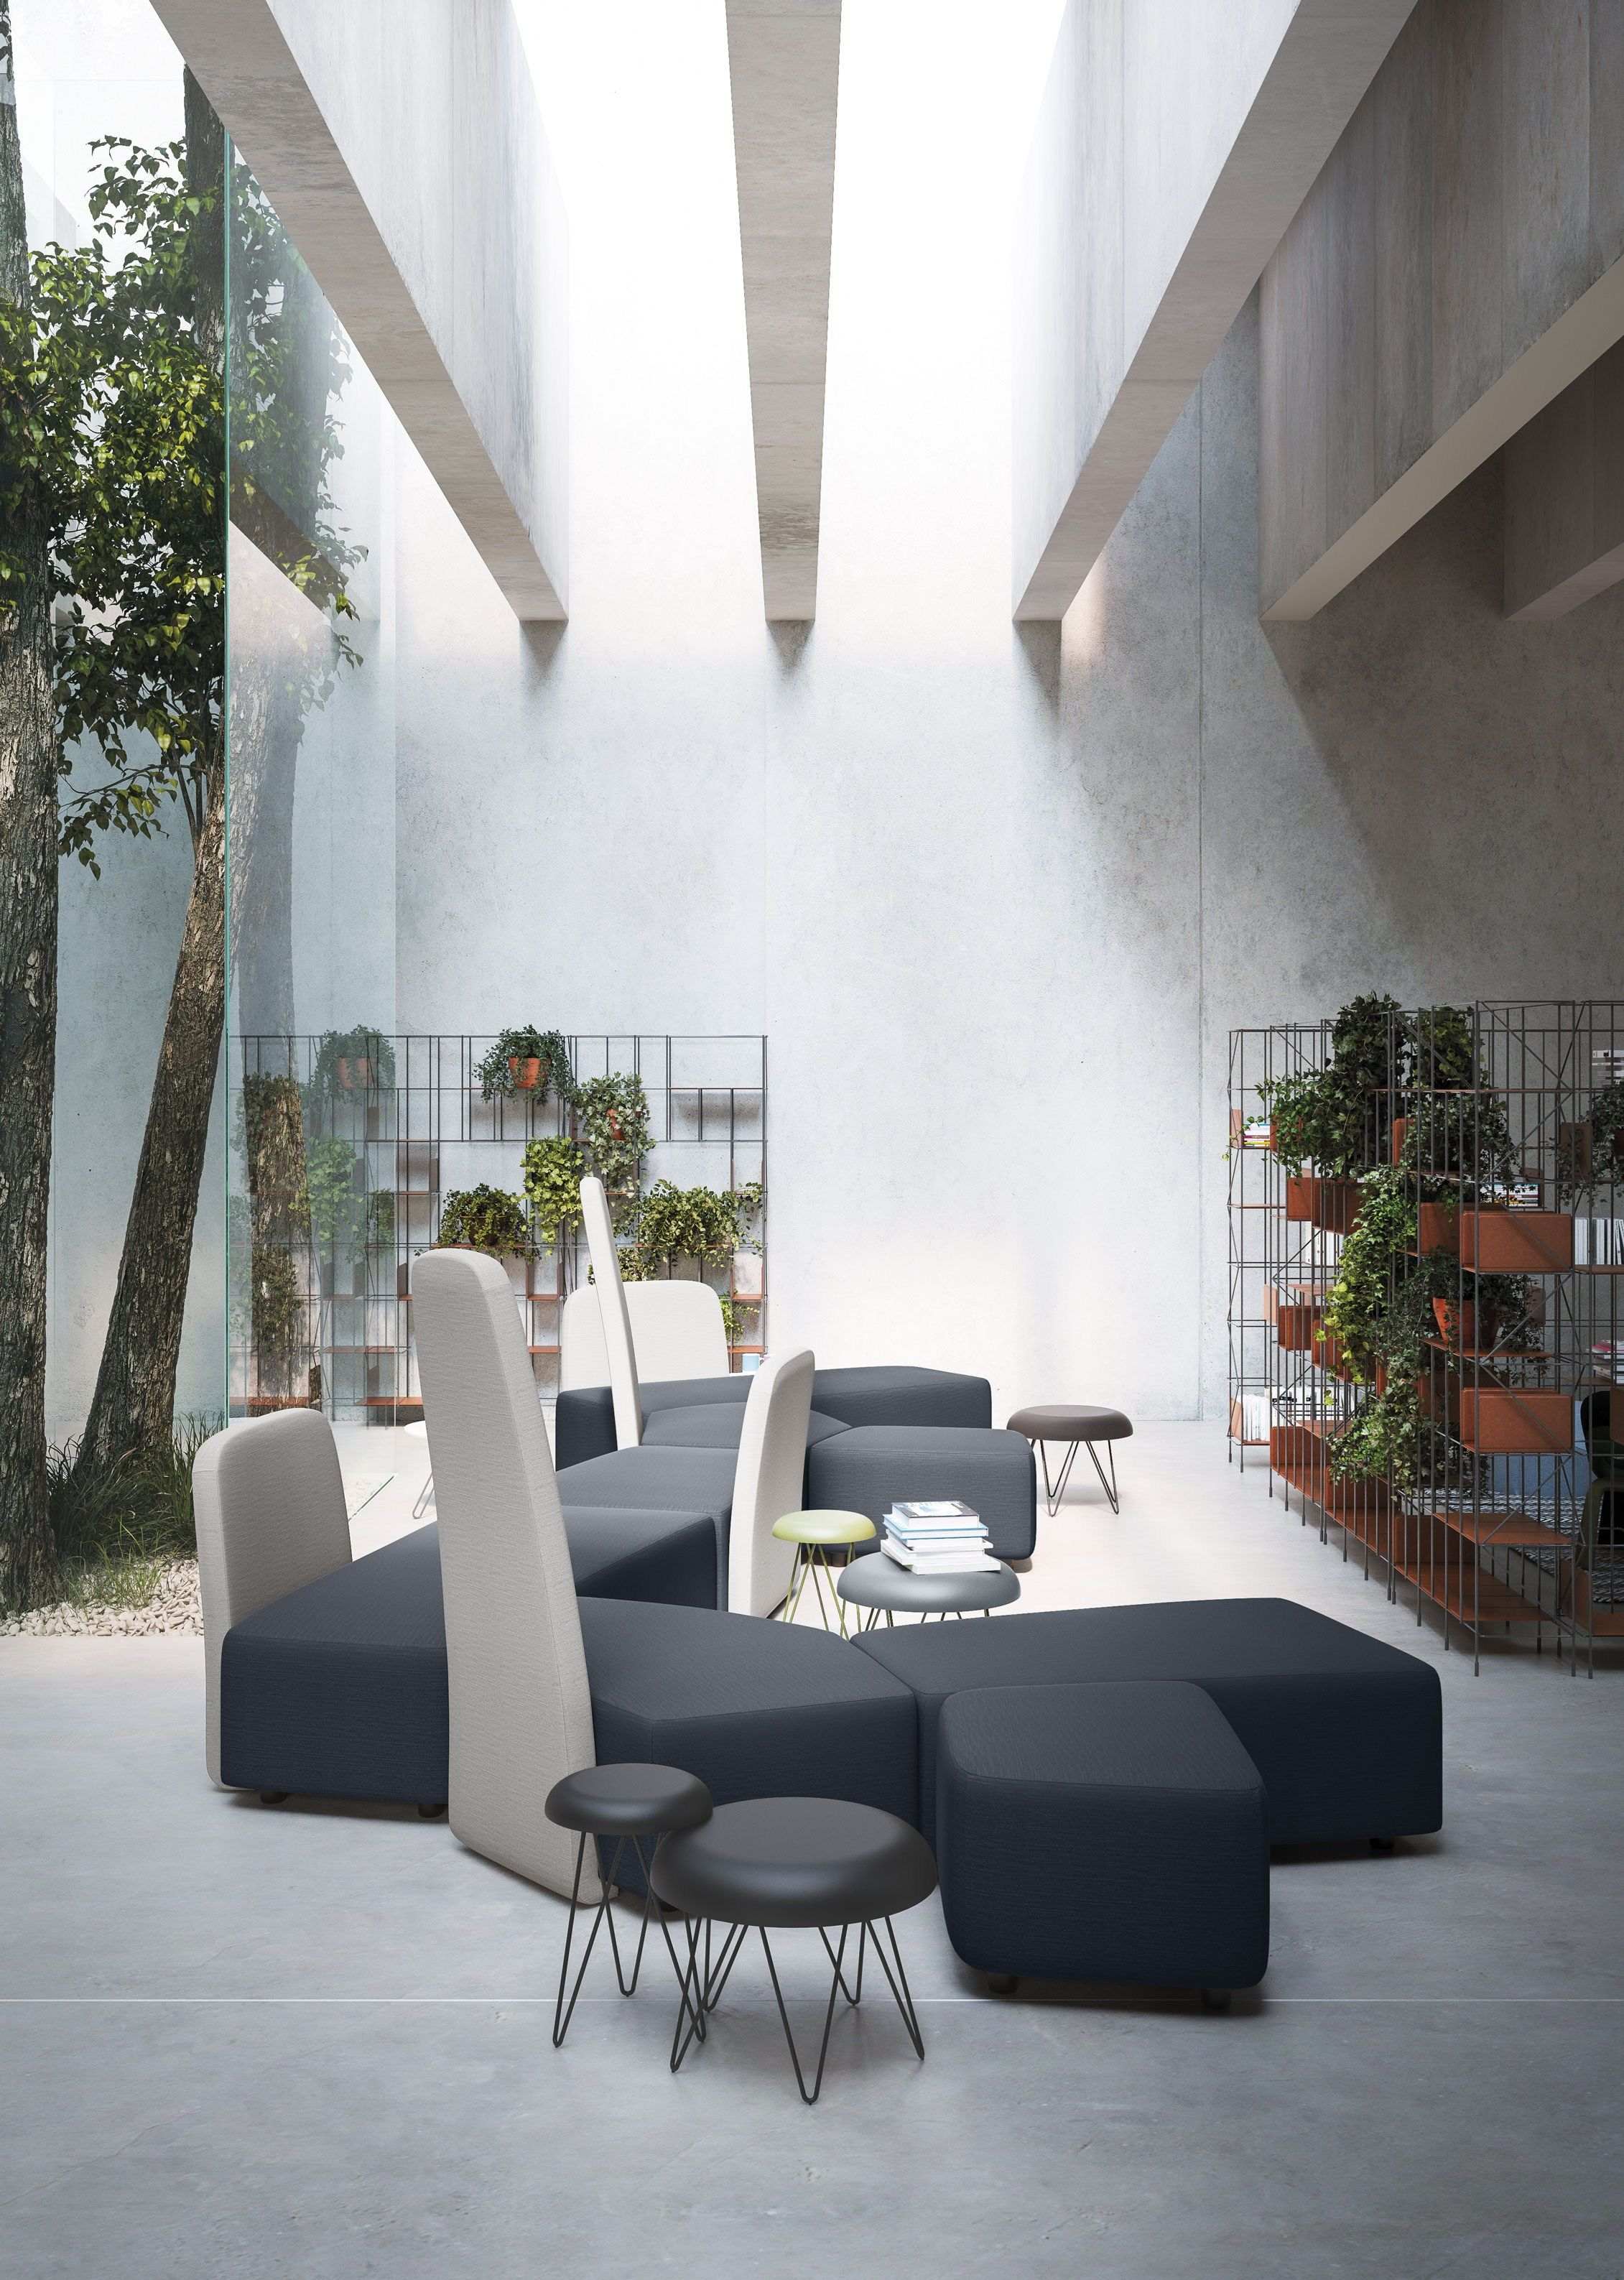 Sectional modular sofa BEN GRIMM By Casamania & Horm